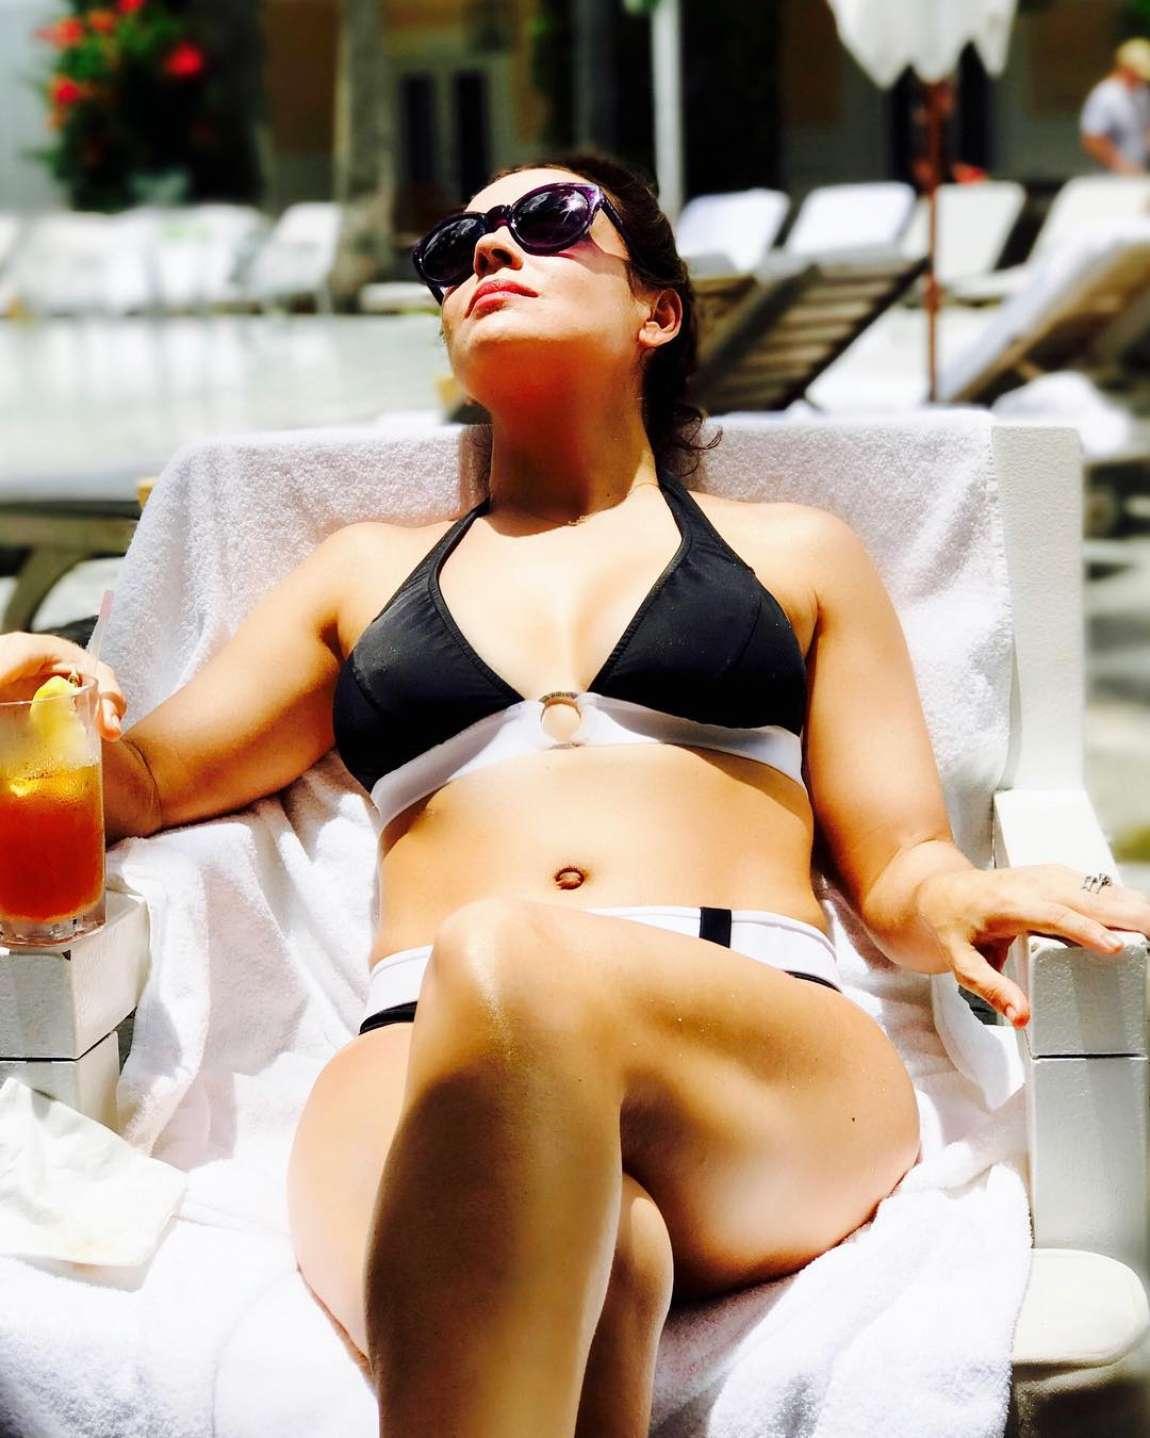 Bikini Alyssa Milano nudes (33 photos), Topless, Paparazzi, Selfie, in bikini 2006